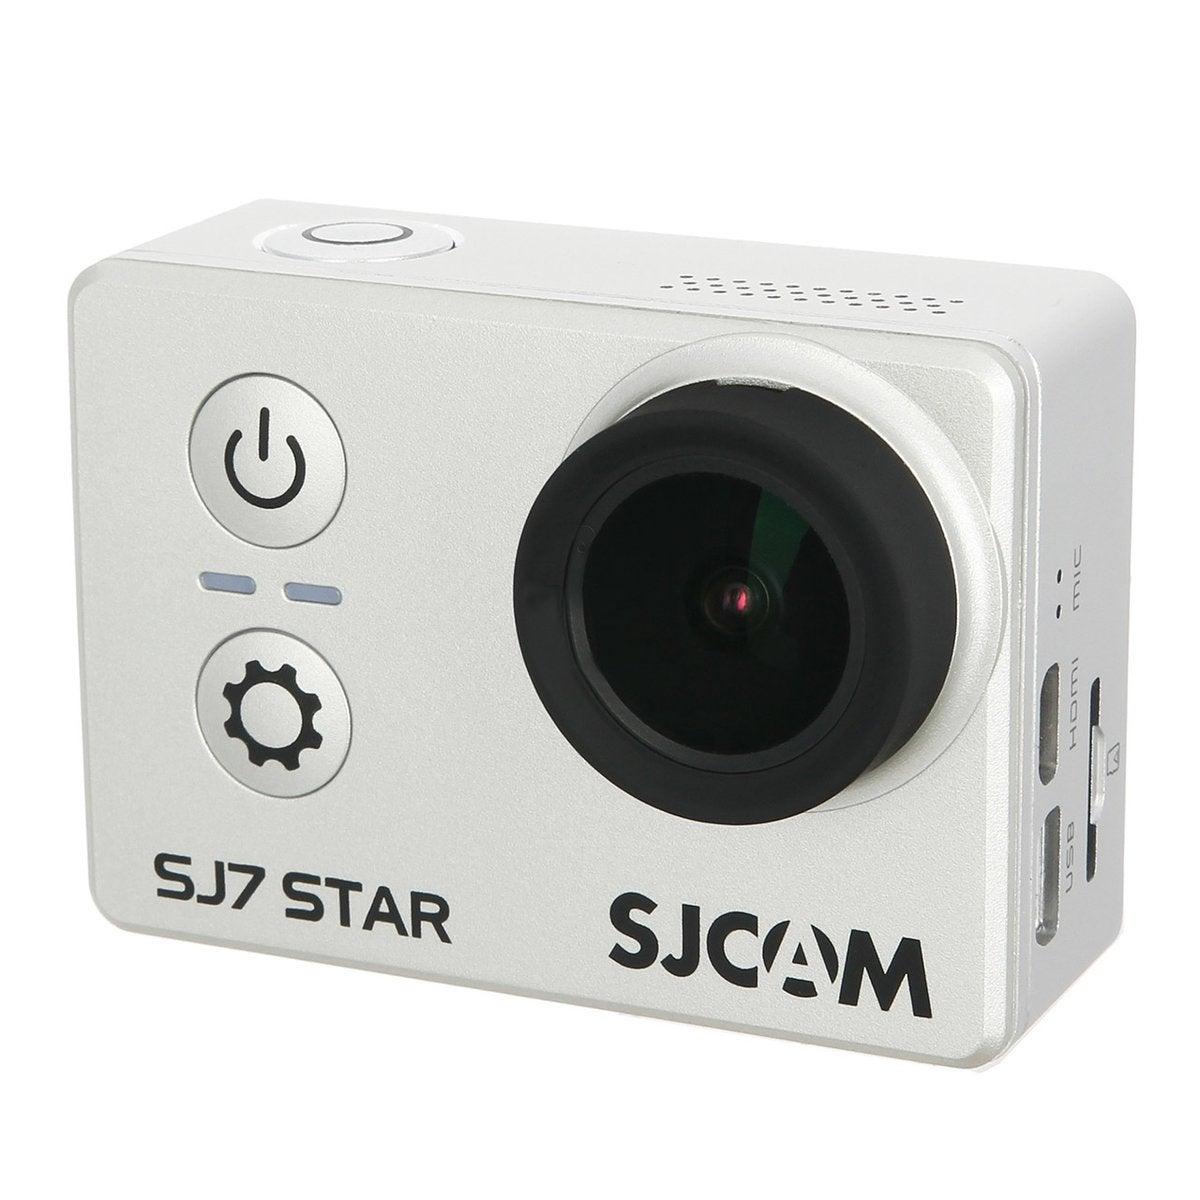 SJCam SJ7 Star Camcorder